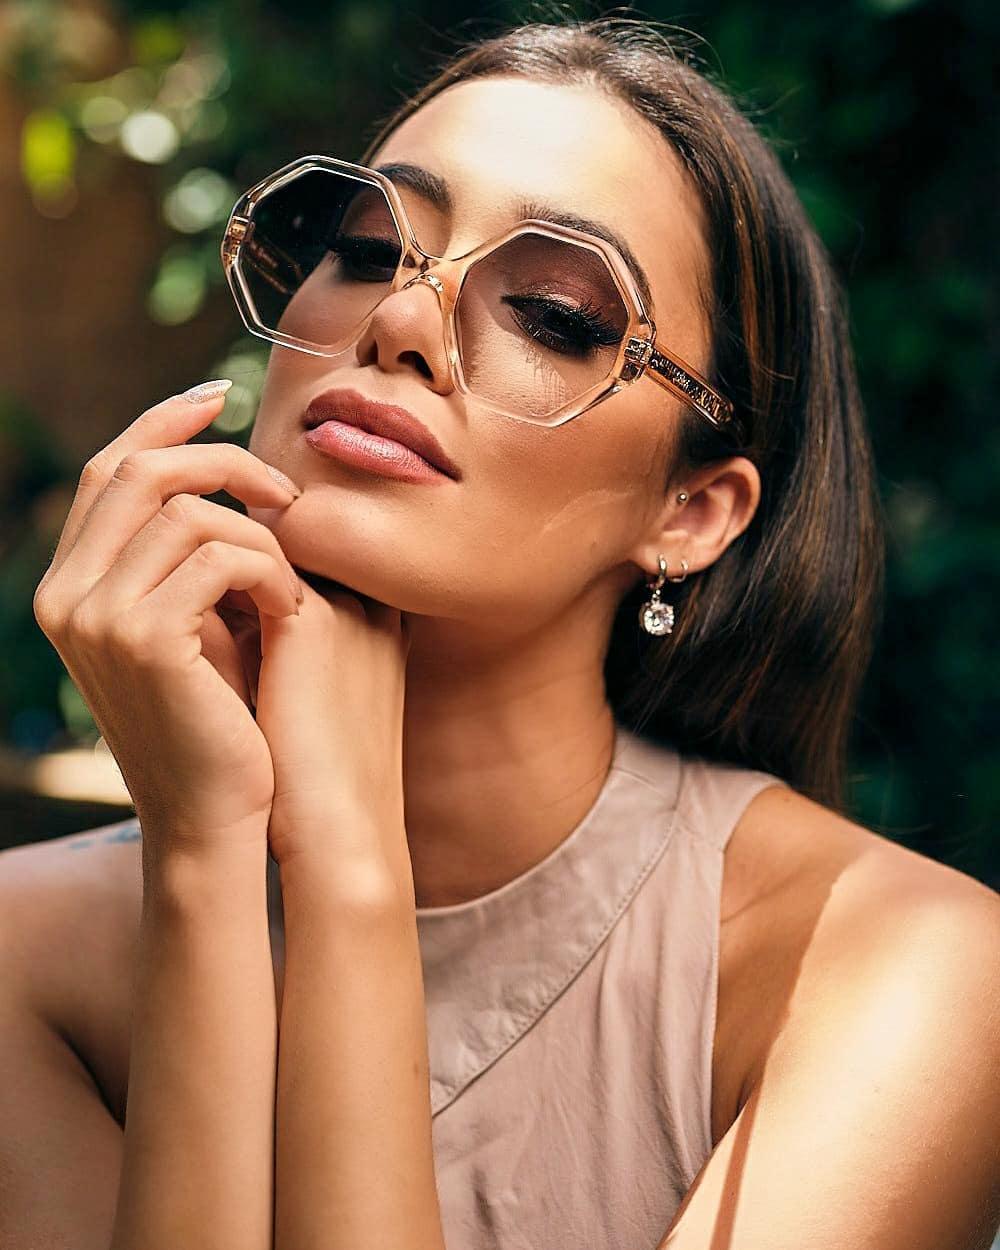 natalia gurgel, top model brasil 2021/miss morada nova 2019/miss sertao central empresarial 2018/top 20 de miss asia pacific international 2018, representando o uruguai. - Página 6 21373420